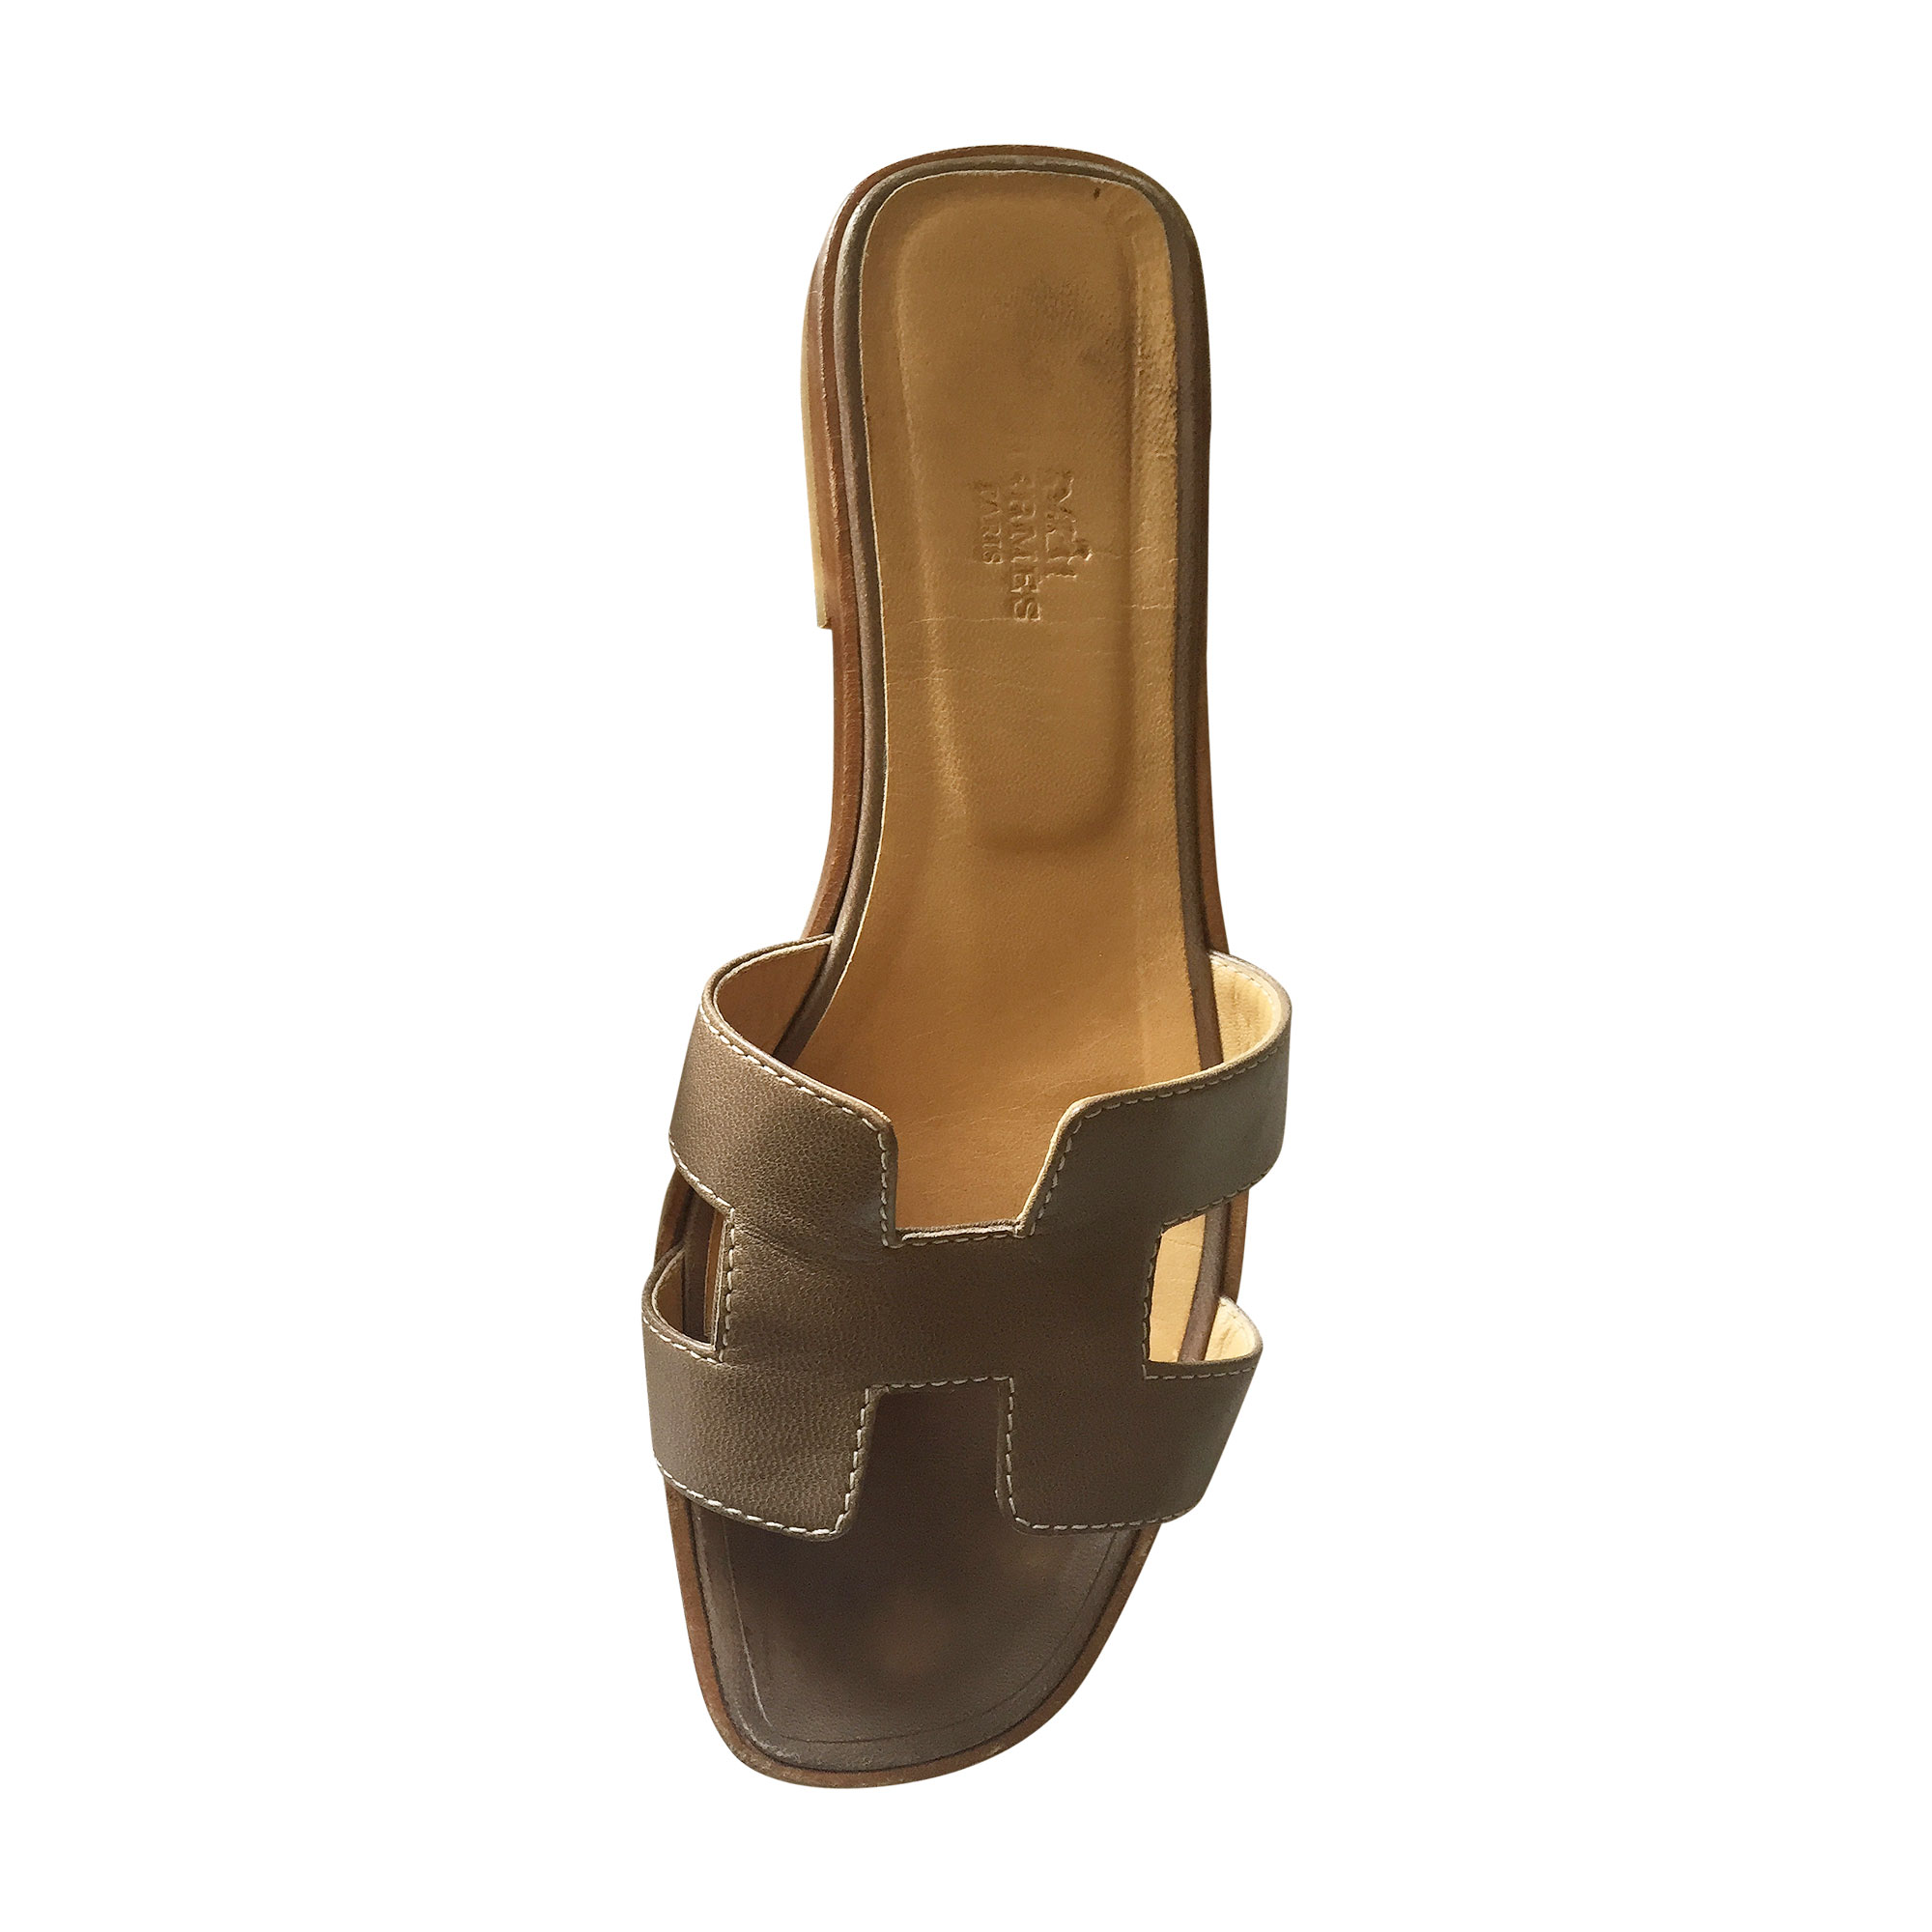 Sandales plates HERMÈS 37,5 beige vendu par Minana225082 - 5039716 7147dbb9c98